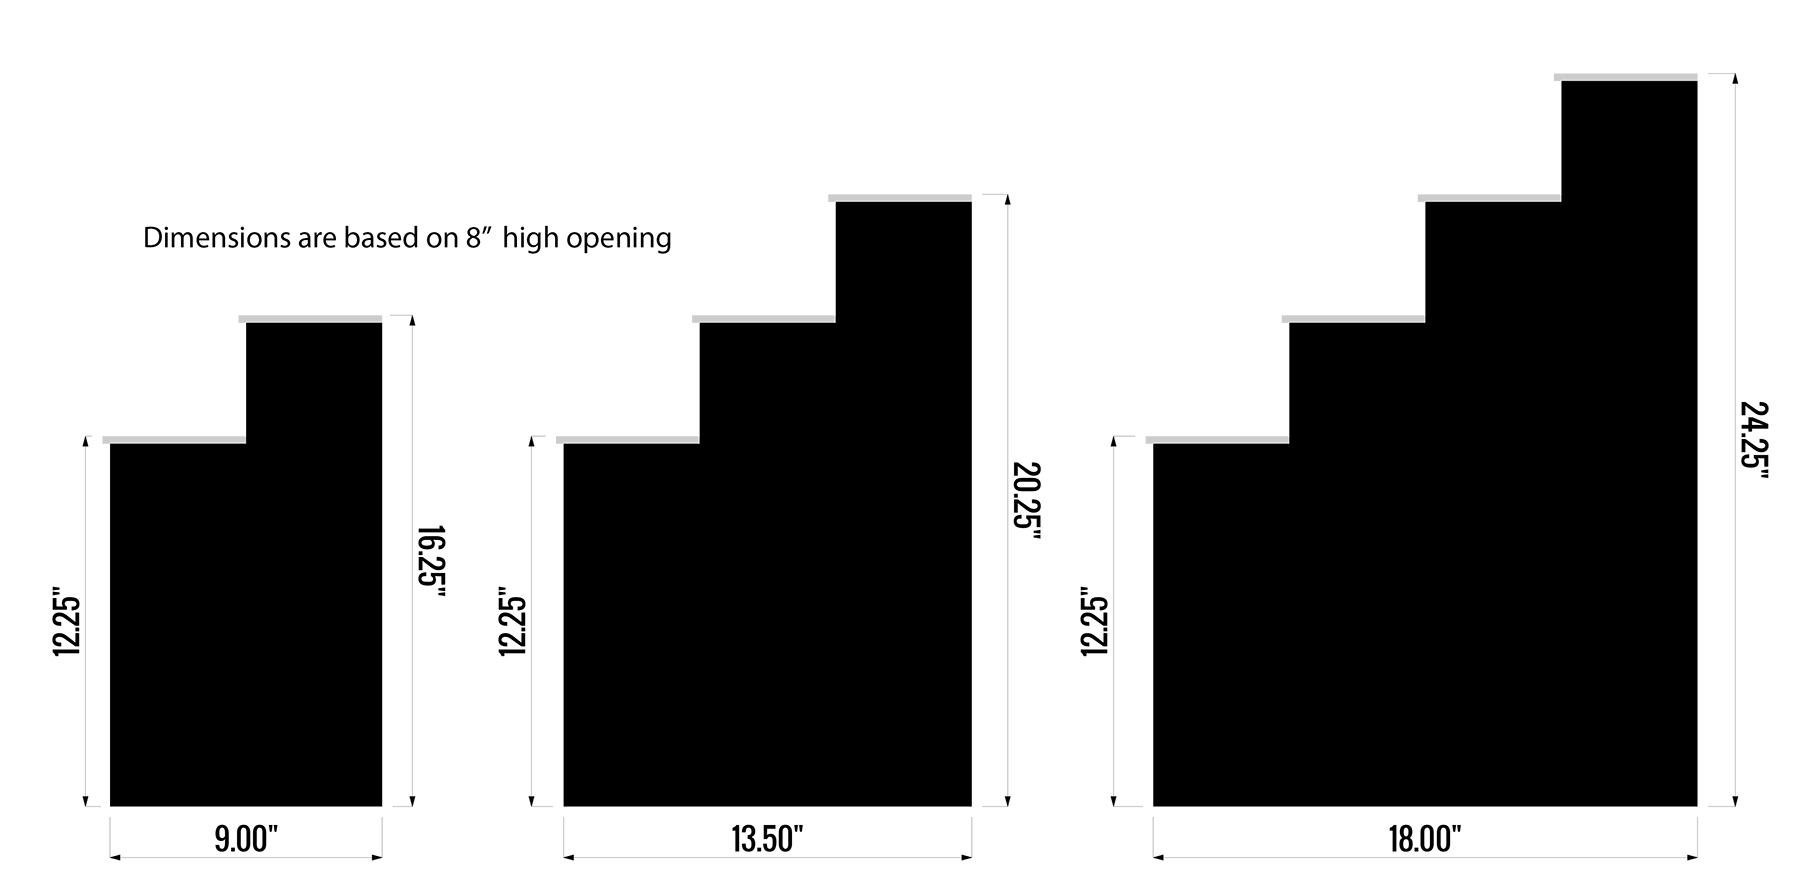 "Raised Liquor Display Dimensions - Based on 8"" Storage Height"